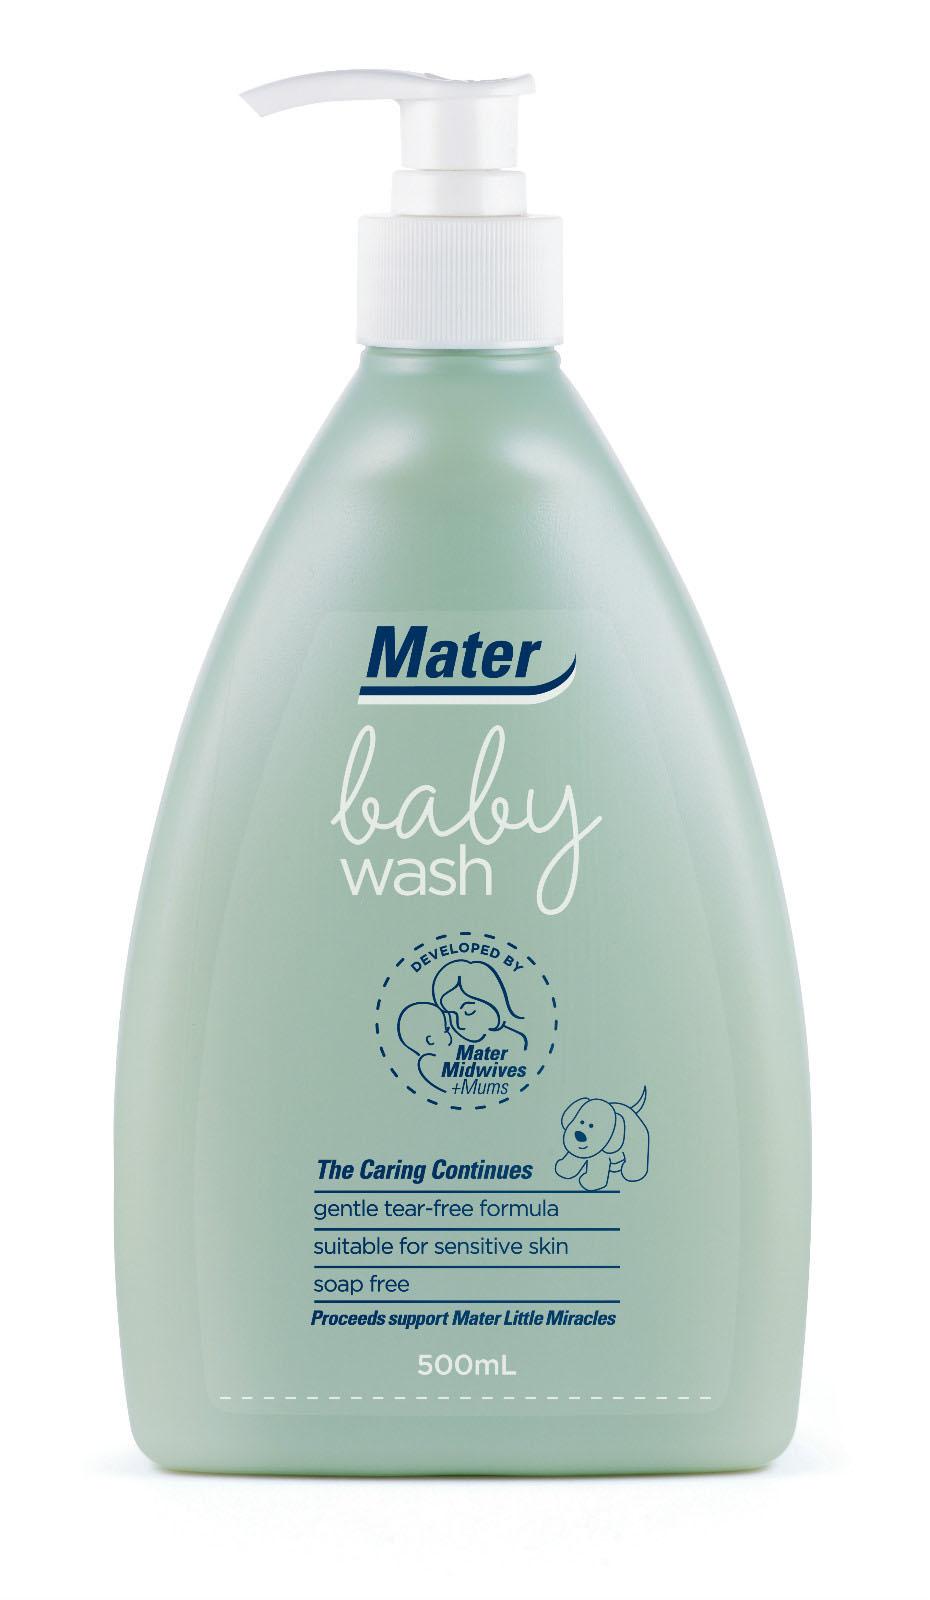 Mater Baby Wash适合敏感肌肤